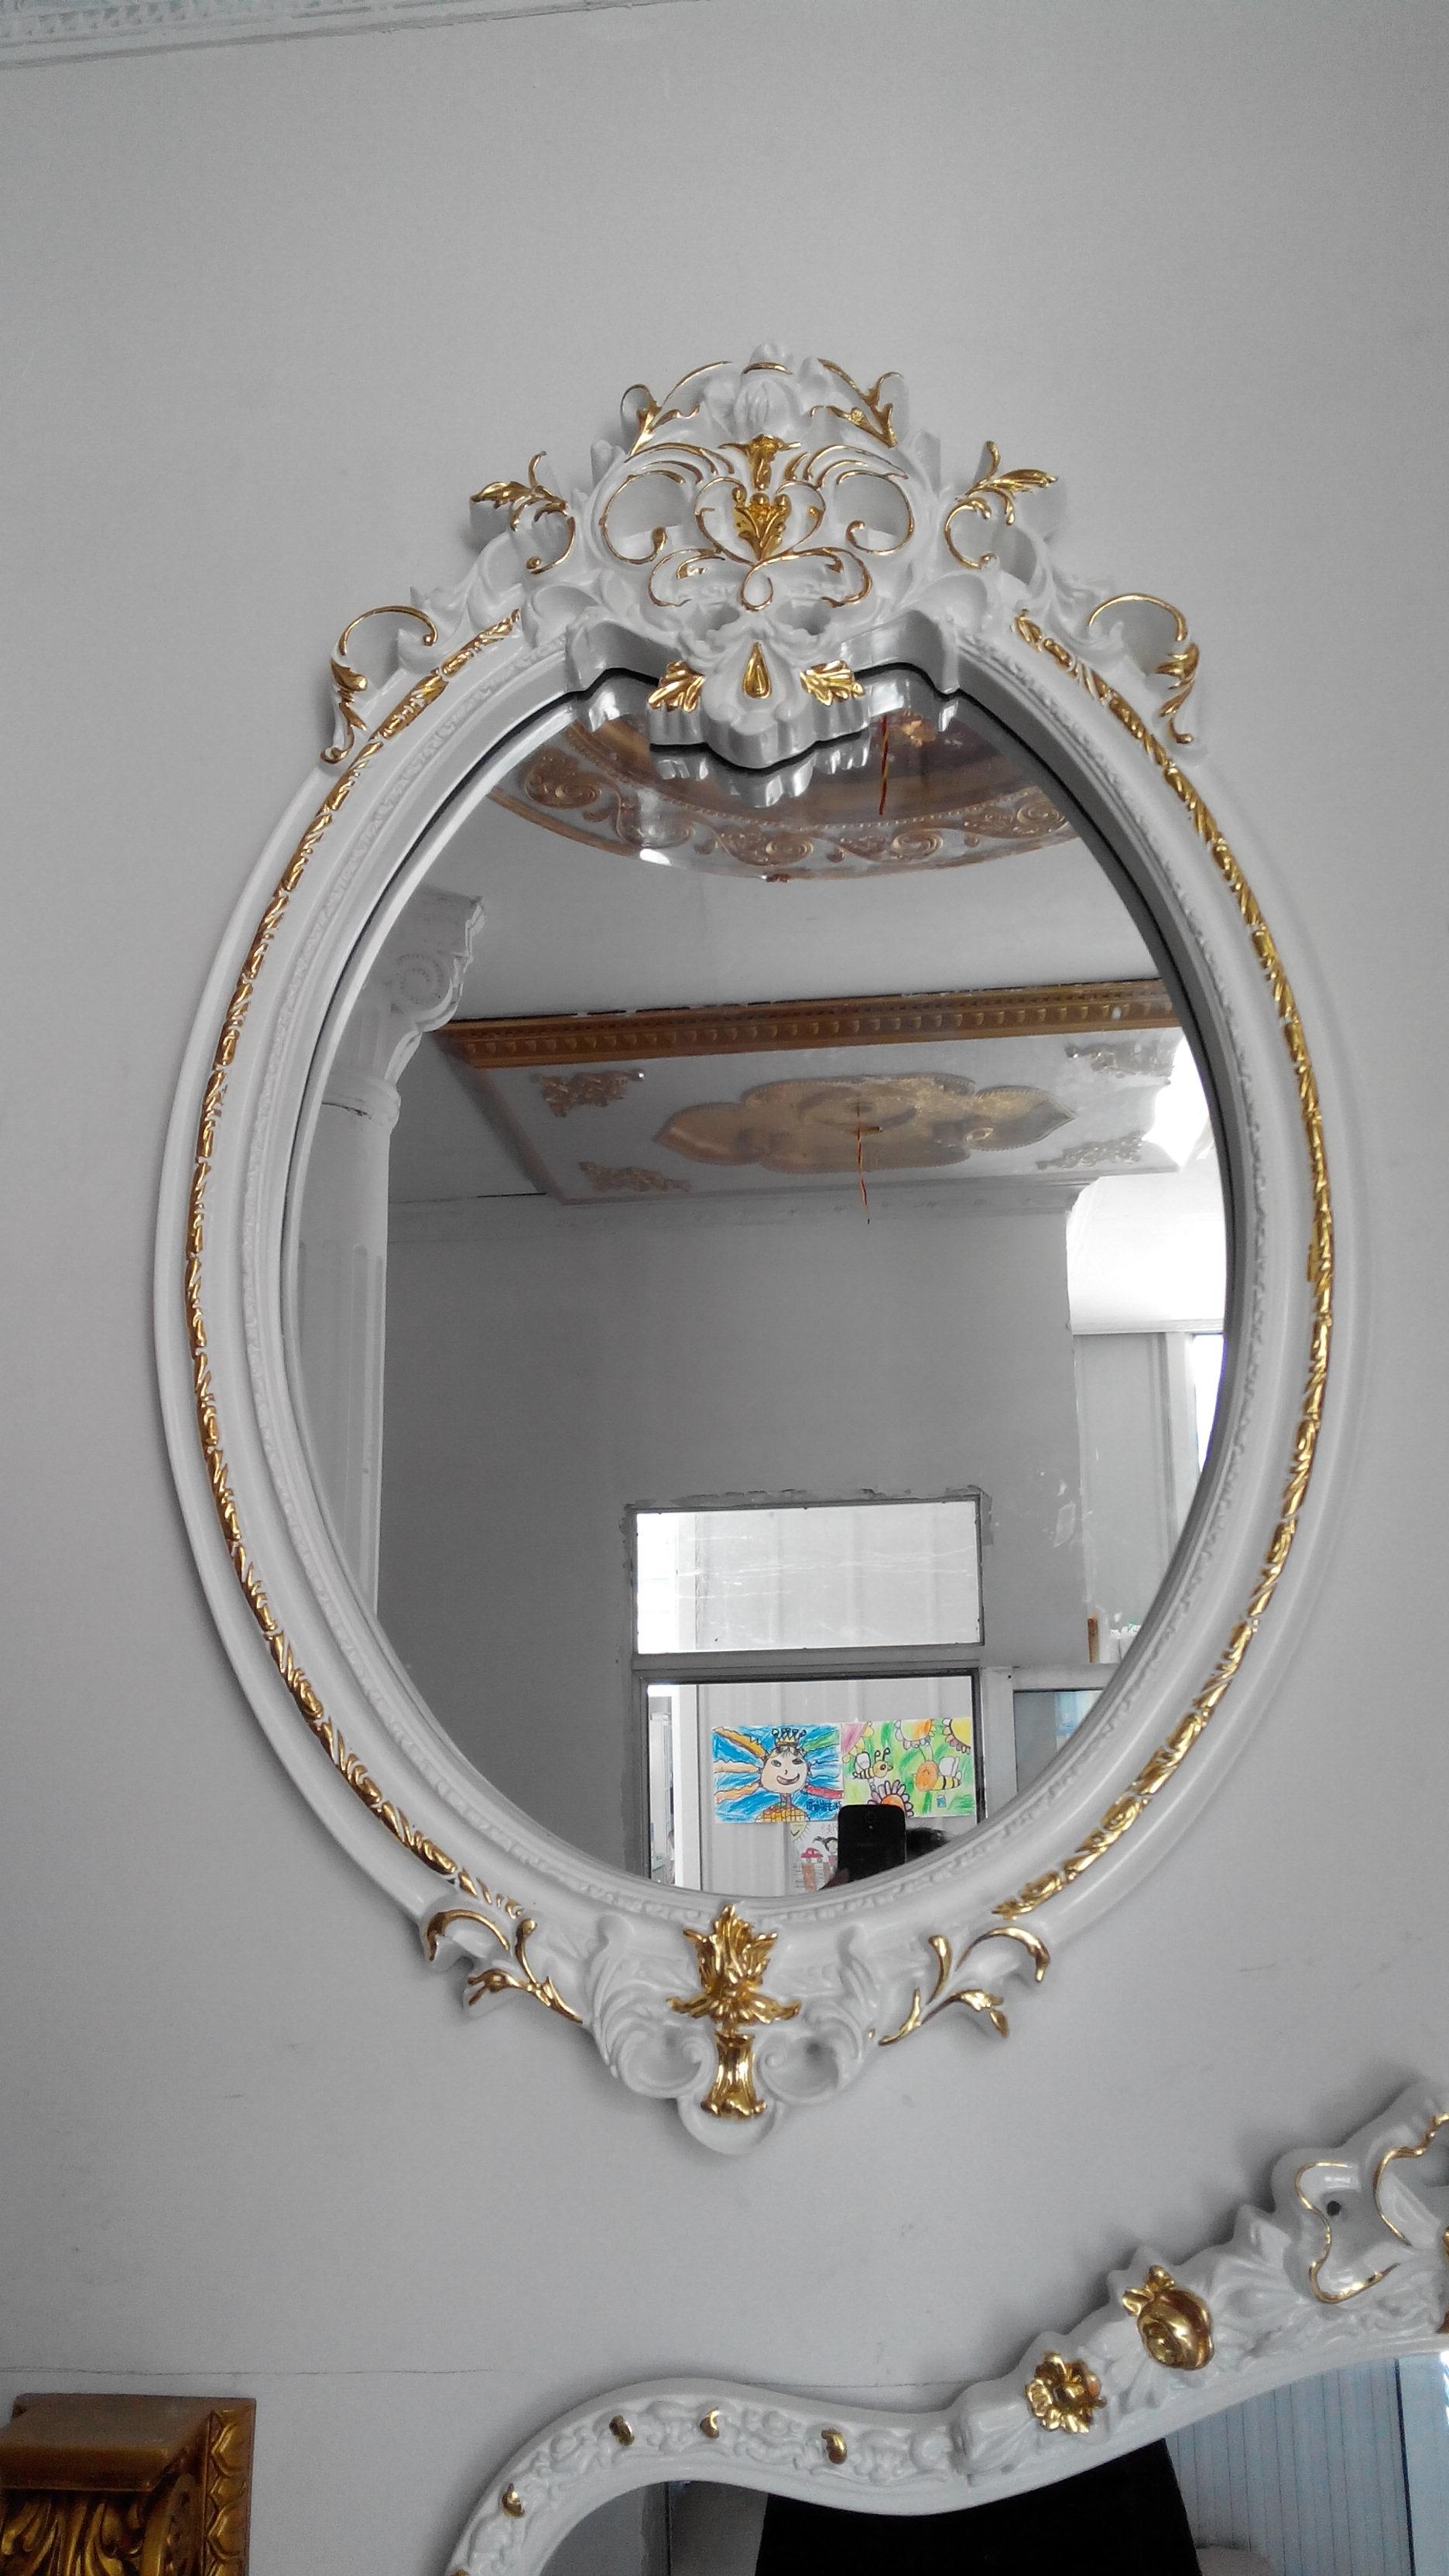 欧式镜子cad